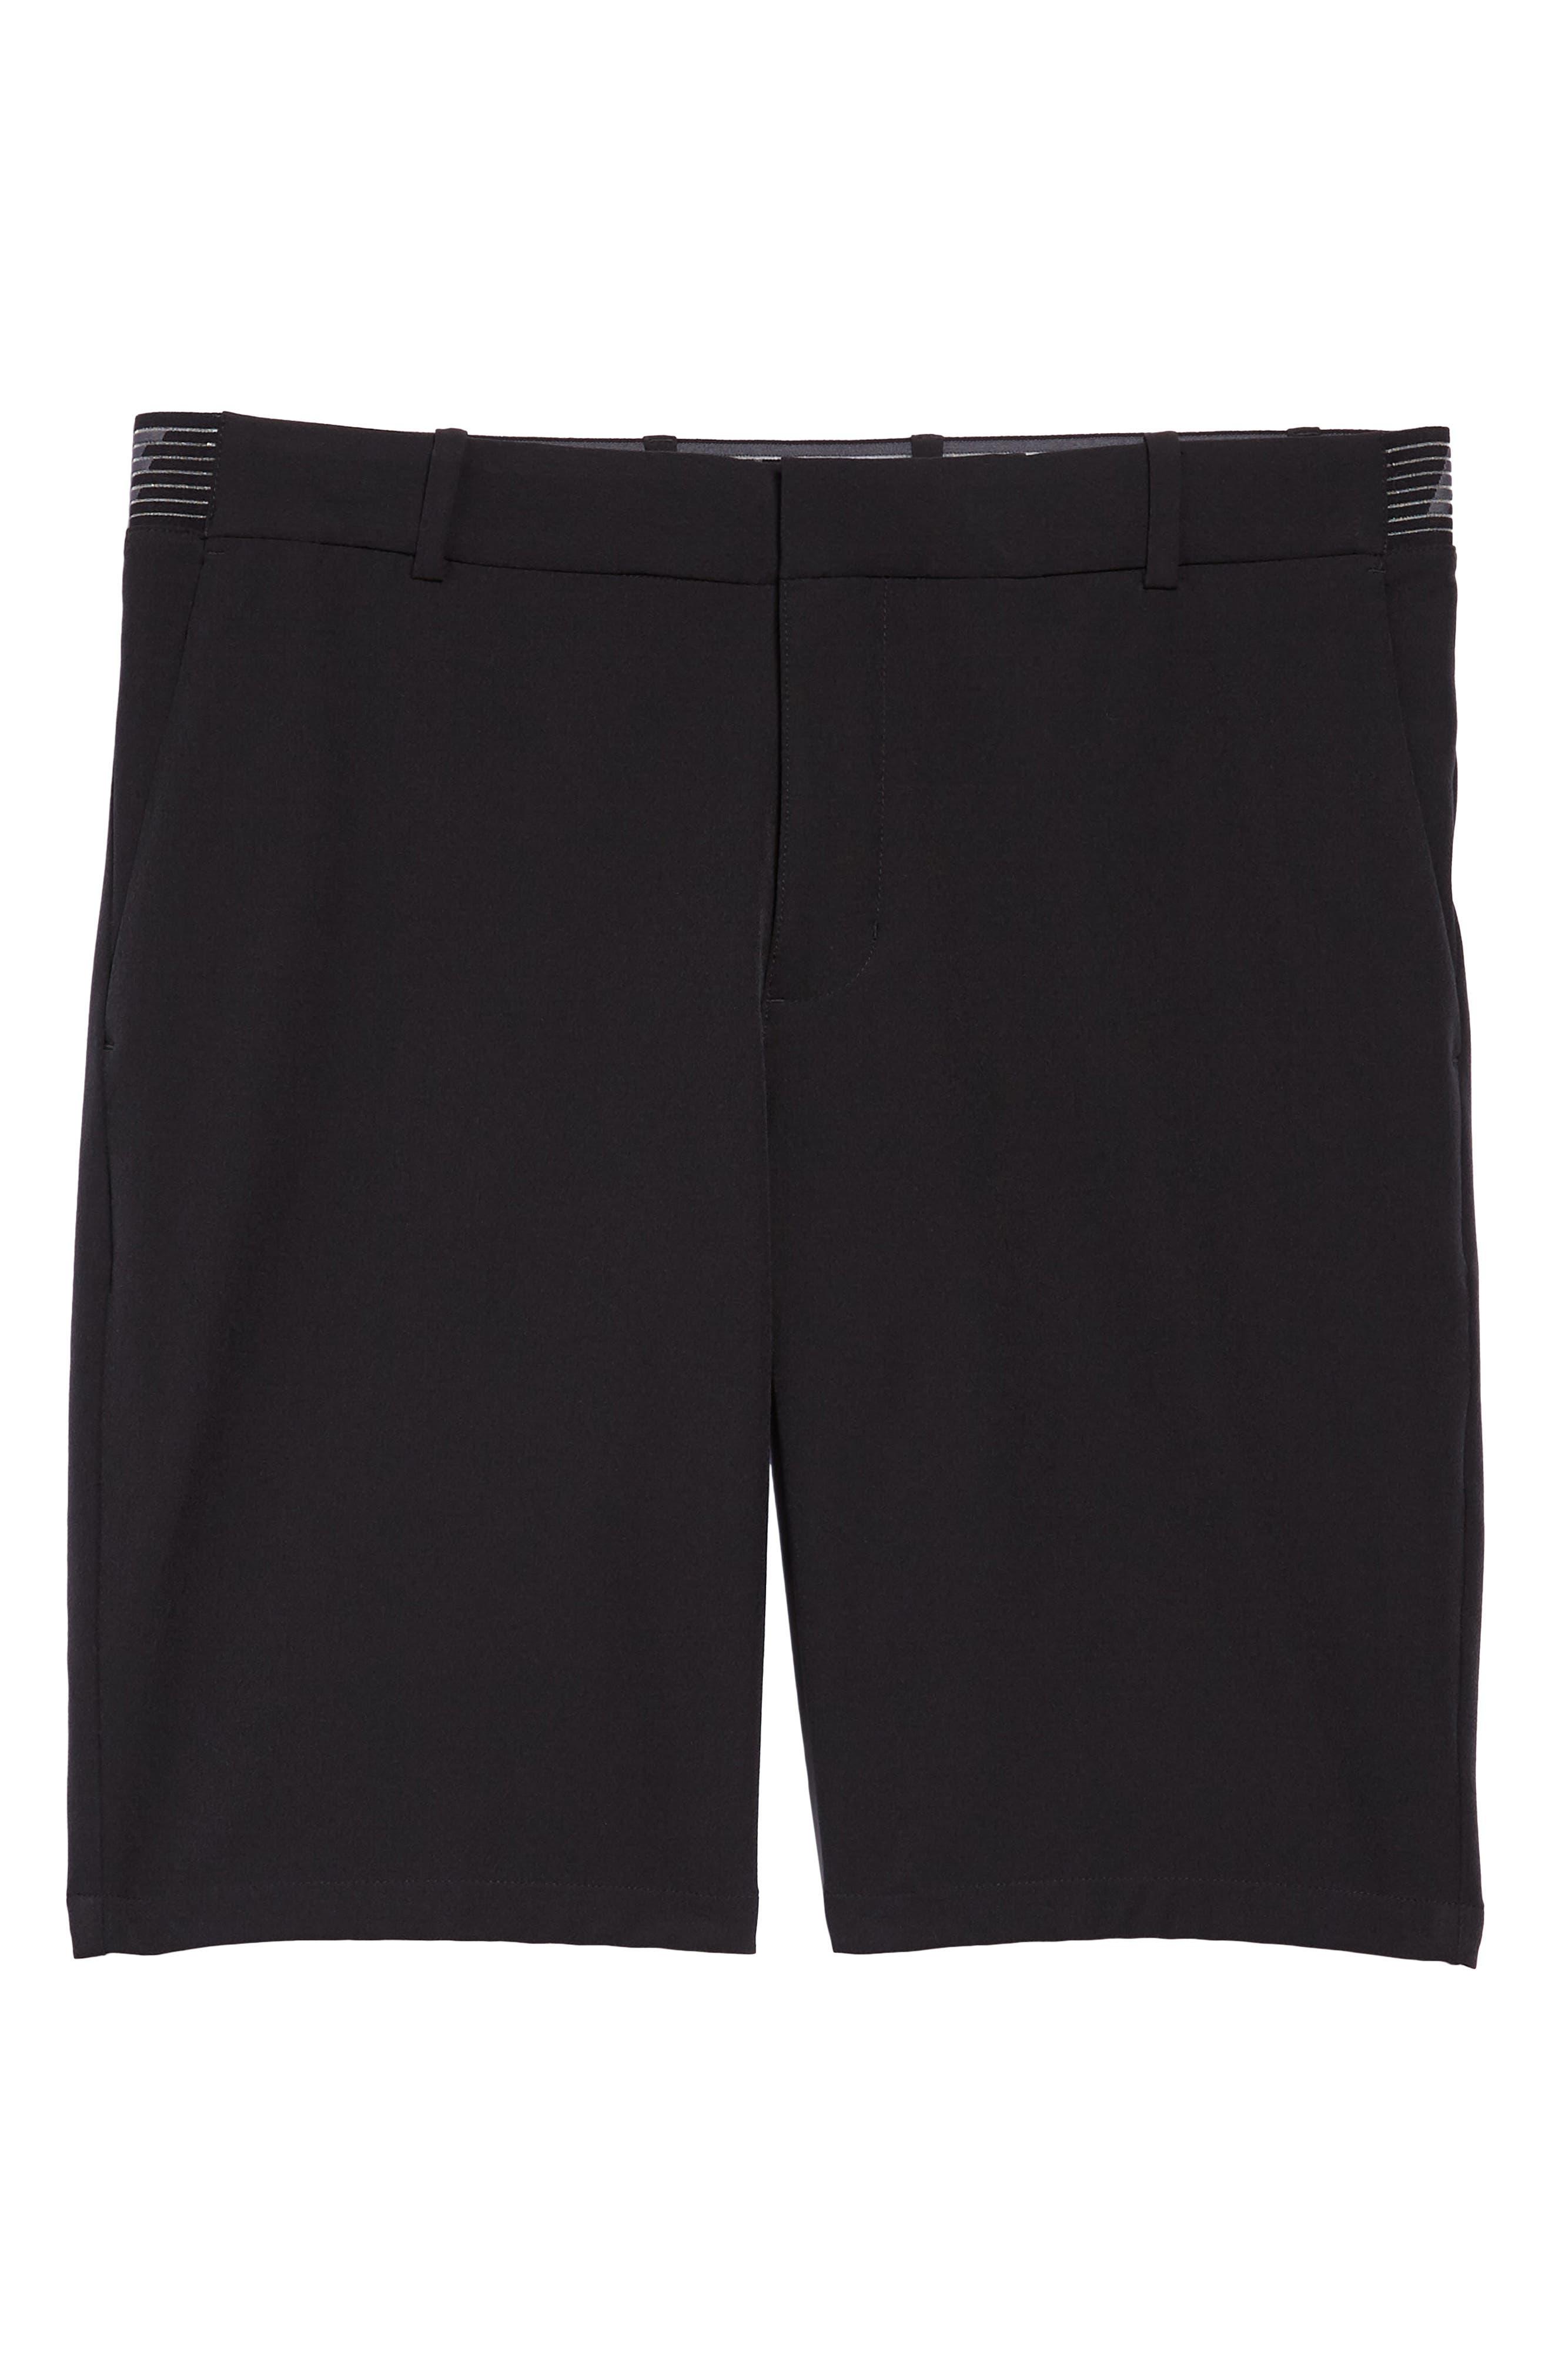 Dry Flex Slim Fit Golf Shorts,                             Alternate thumbnail 6, color,                             Black/ Black